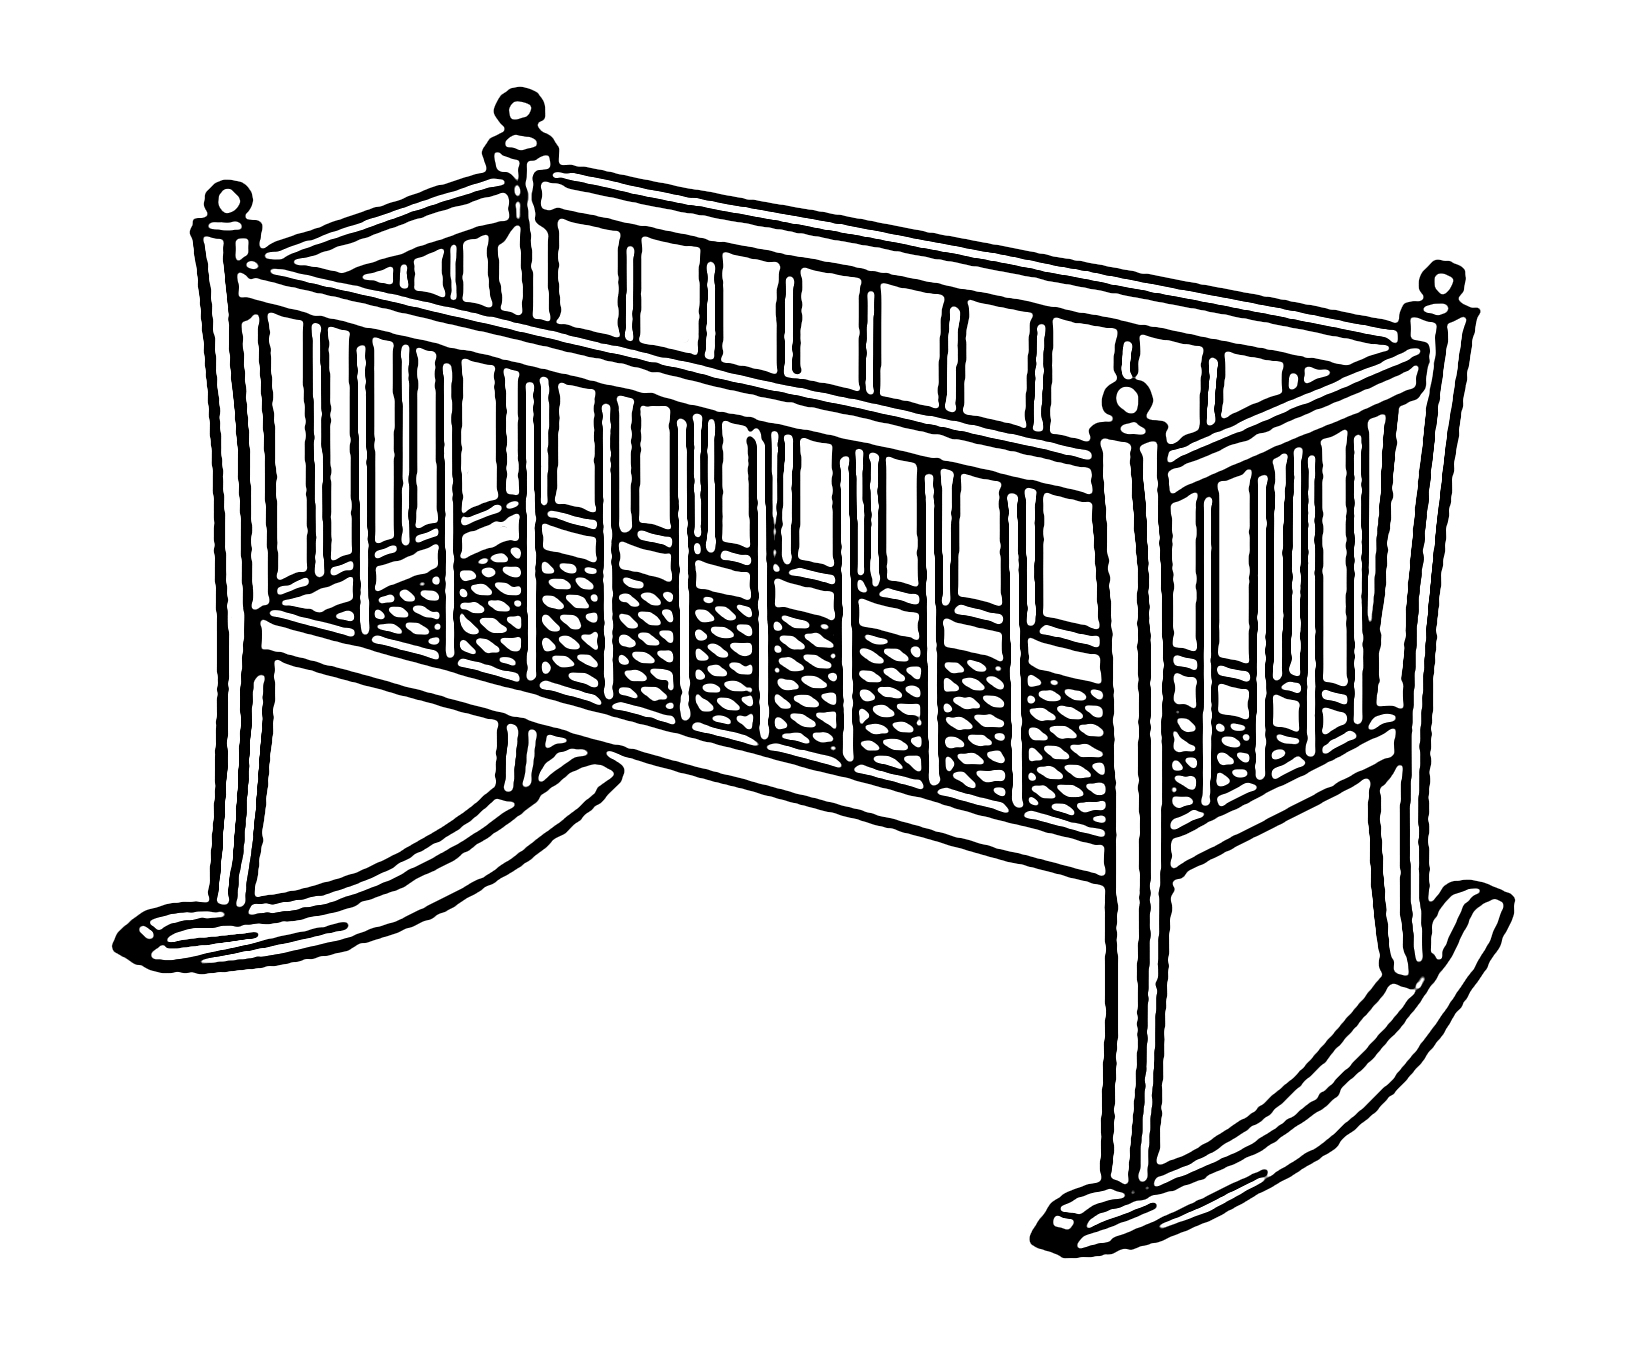 bastard cradle